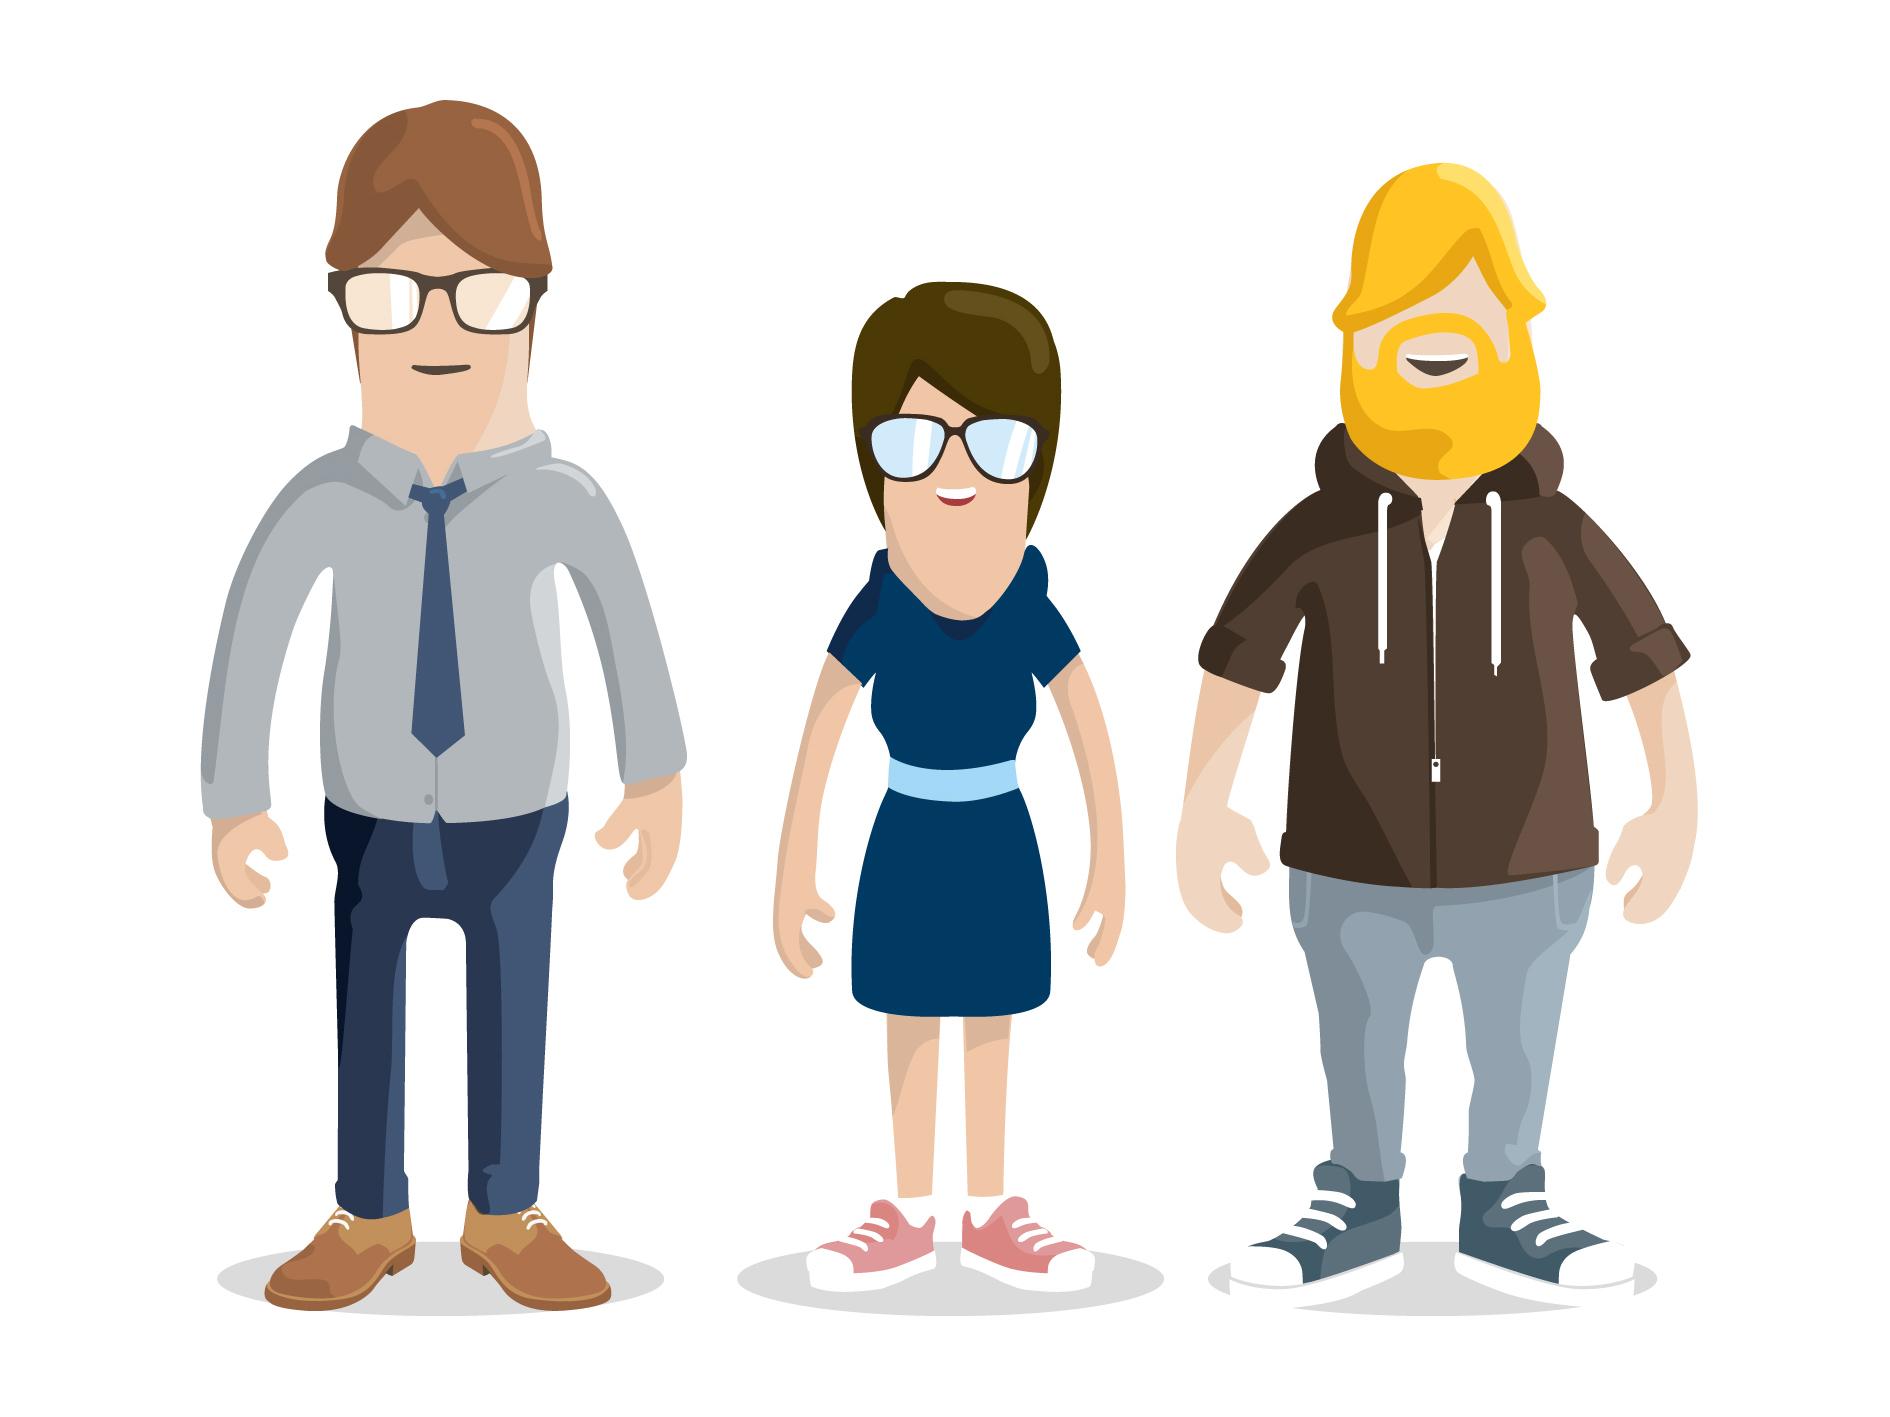 Character Design Studio : Character design polyester studio